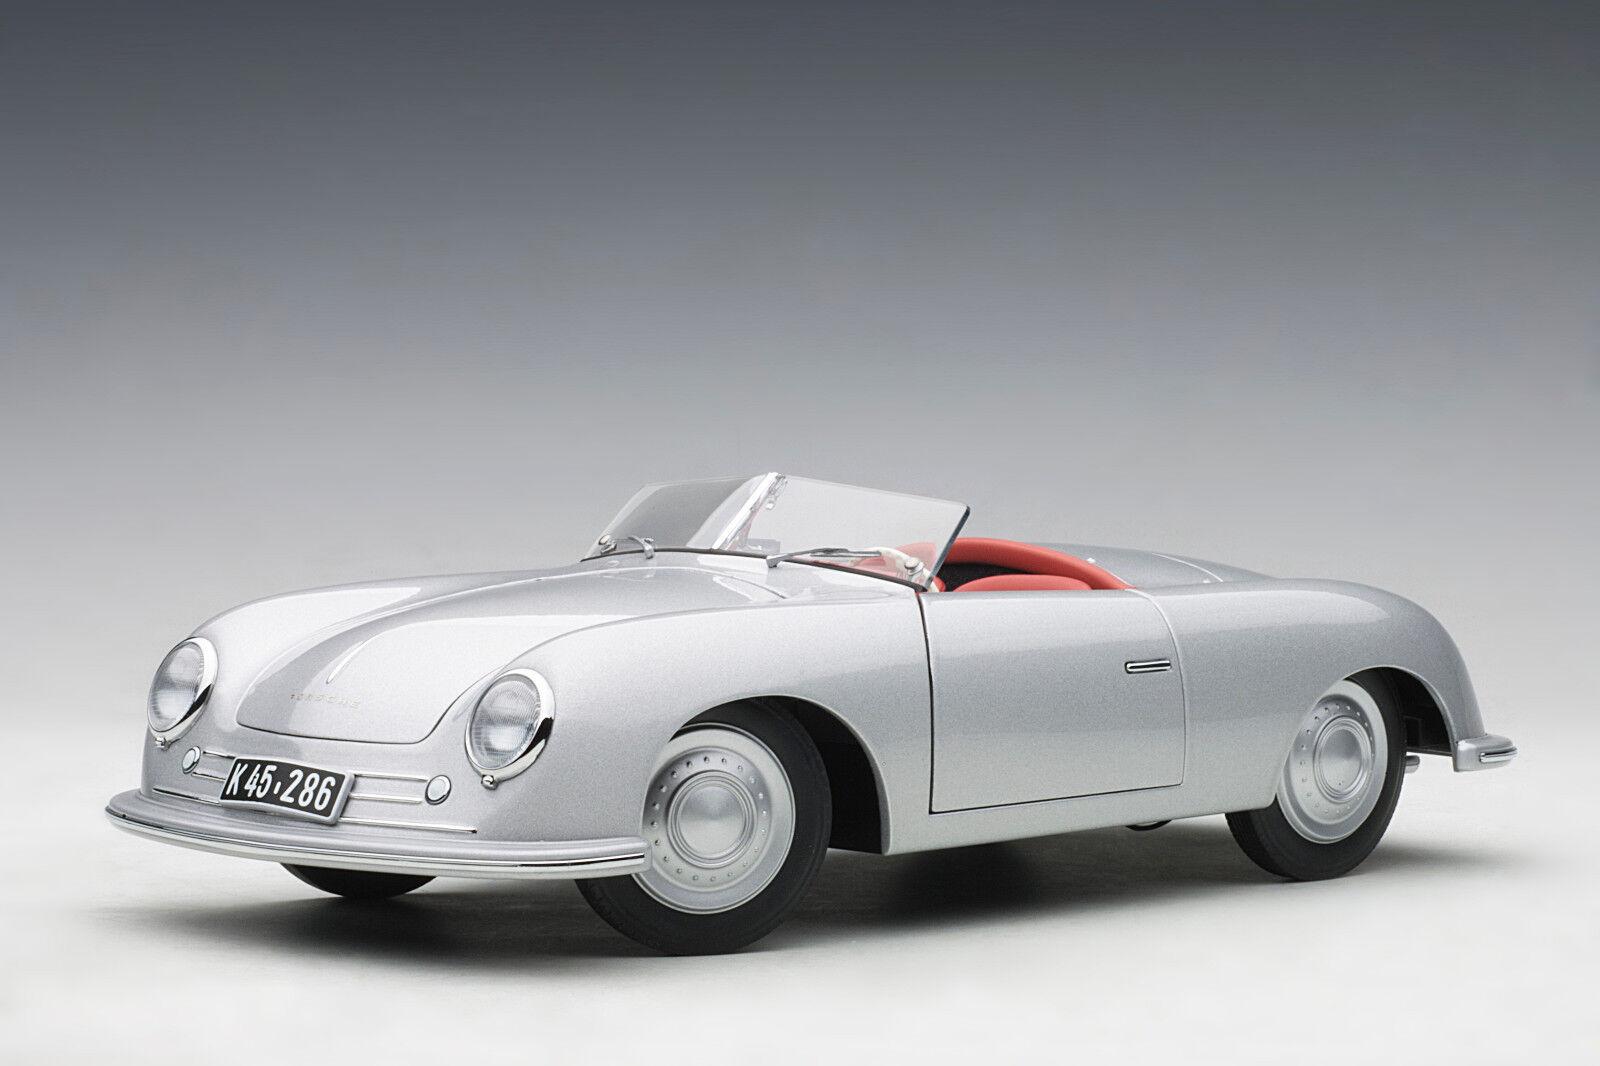 78072 Porsche 356 No 1,1 18 bilkonst